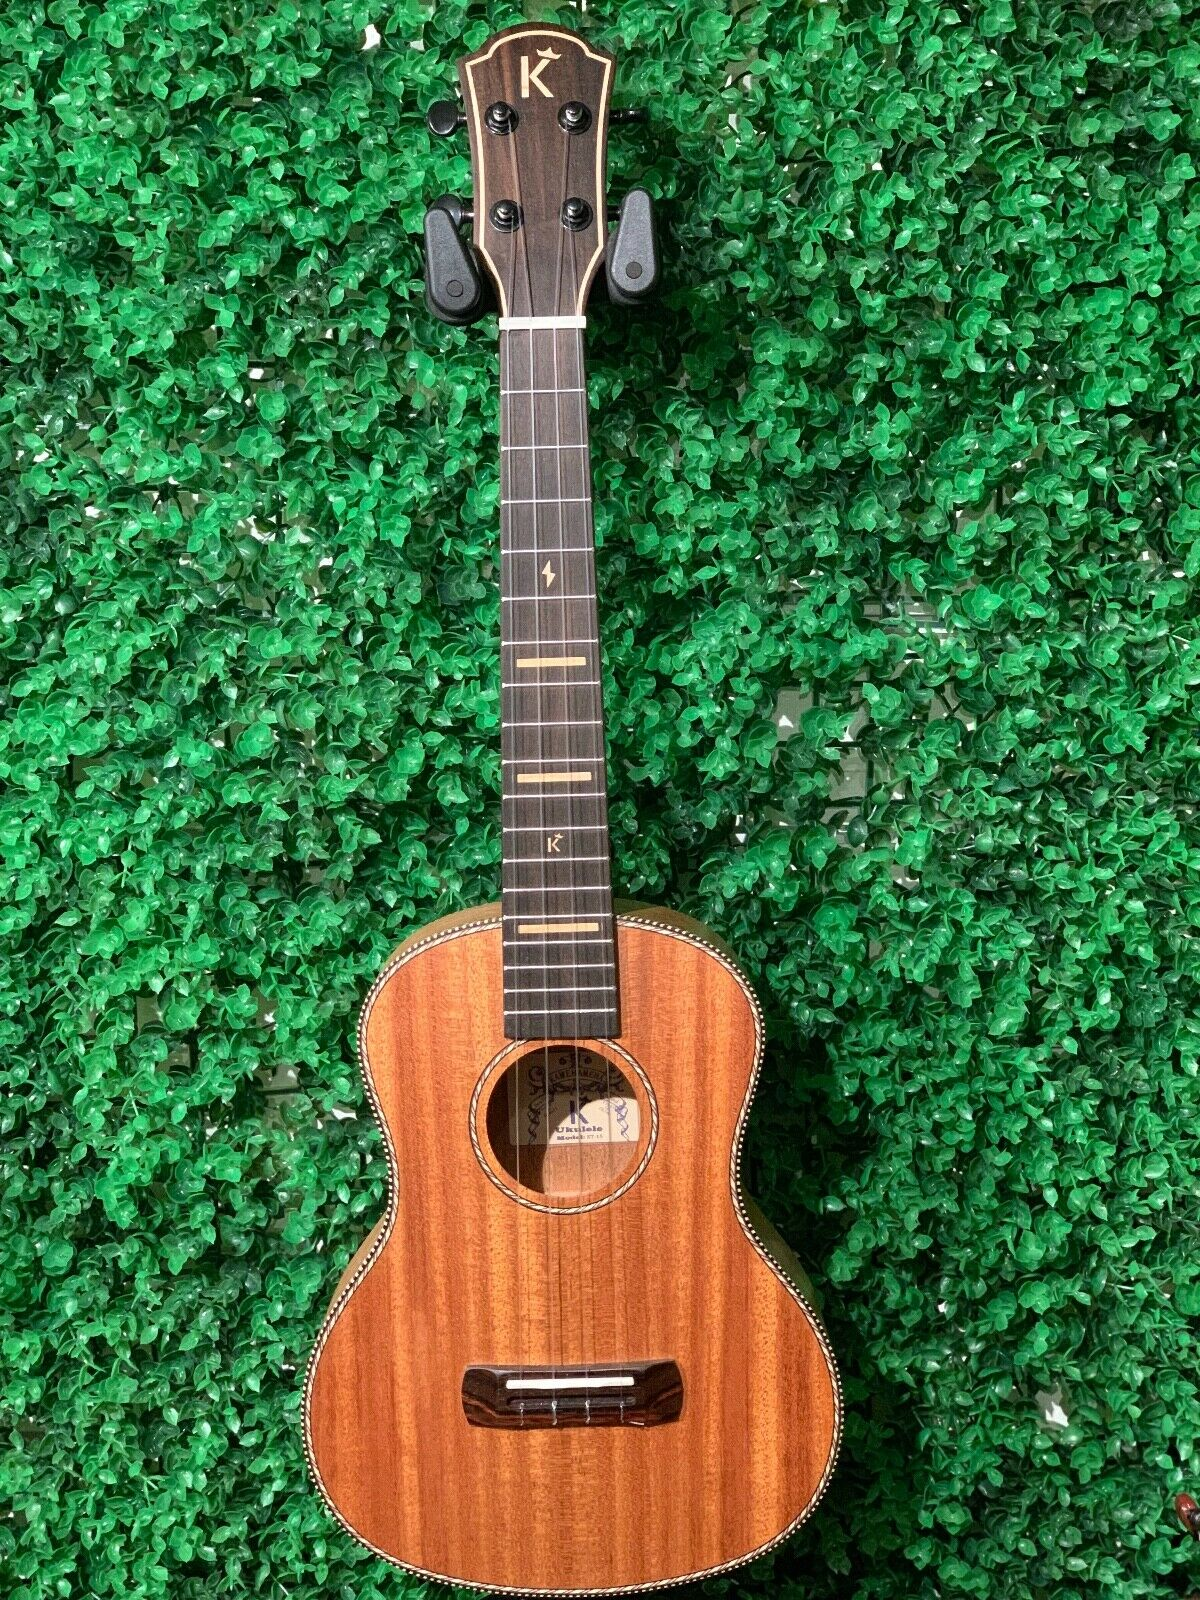 Kamehameha Ukulele KT-15 Tenor Mahogany Come with case&strap&tuner